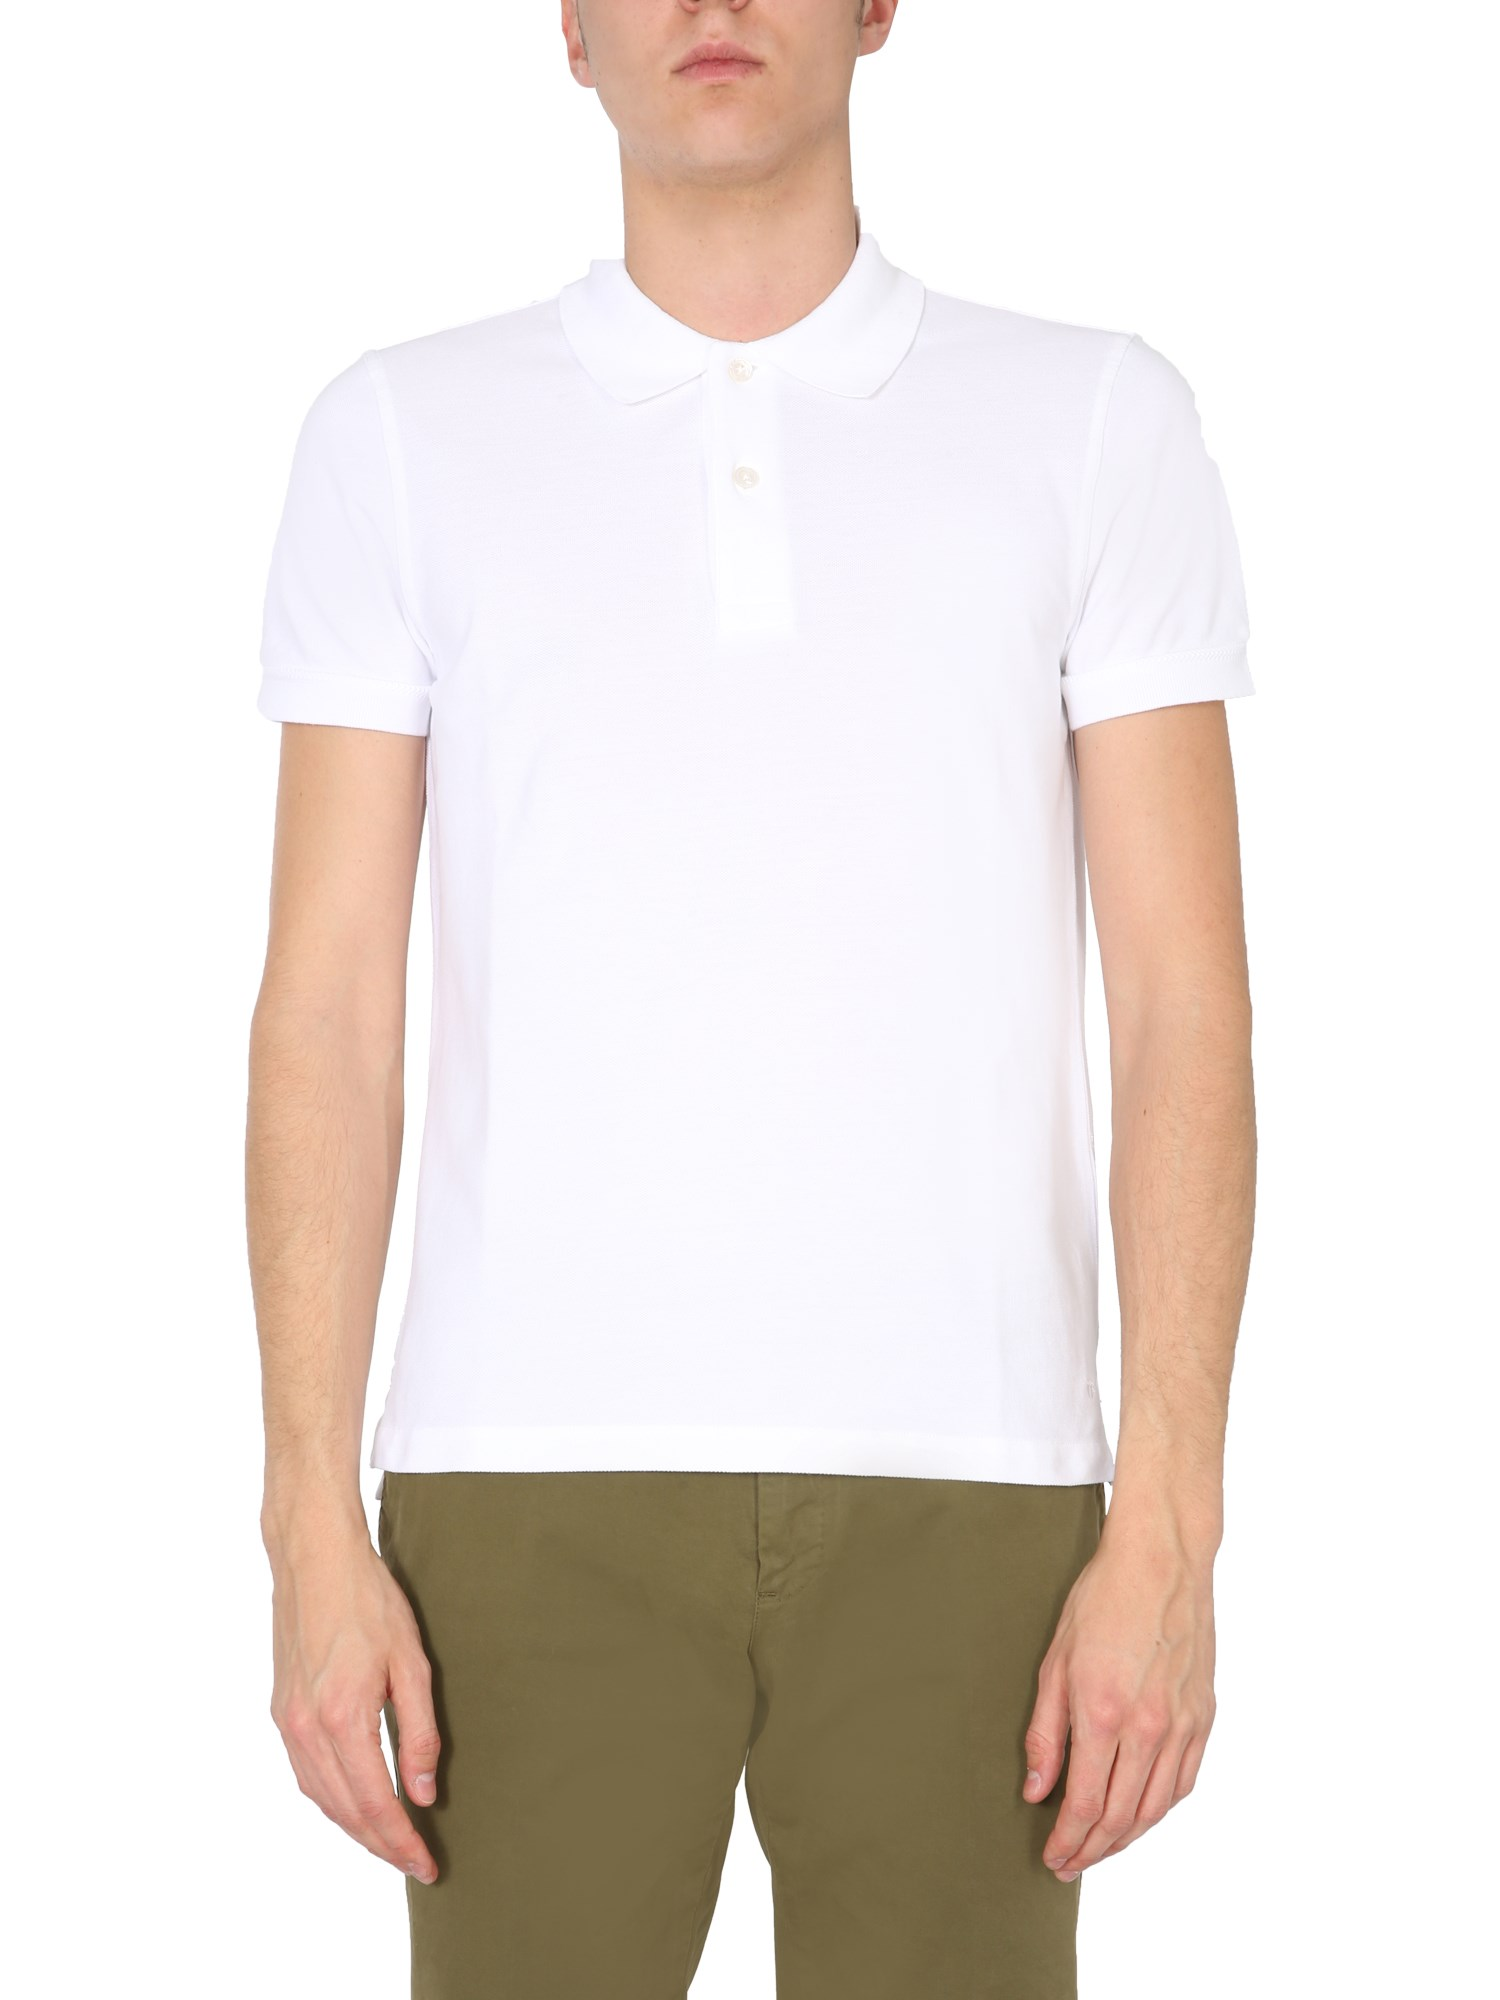 tom ford cotton piqué polo shirt